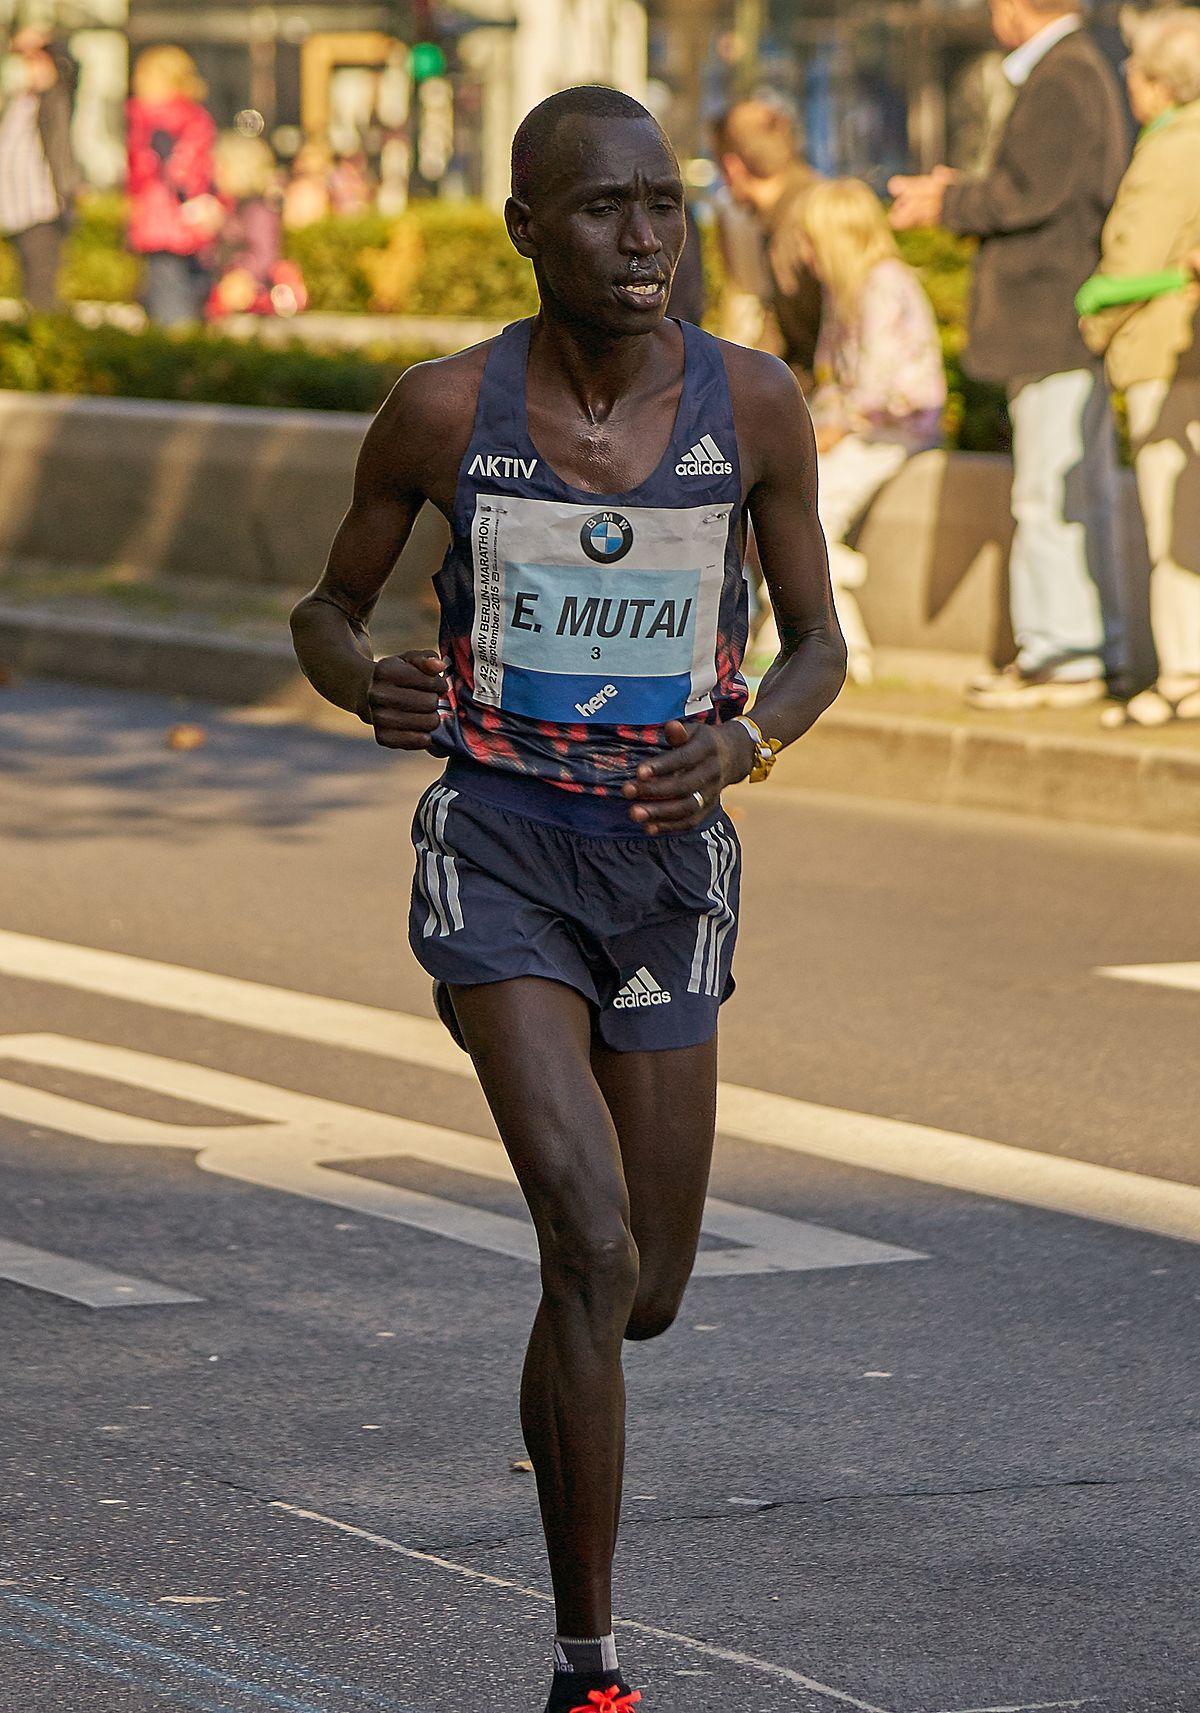 Mutai steps up to lead Kenyan Boston Marathon hunt